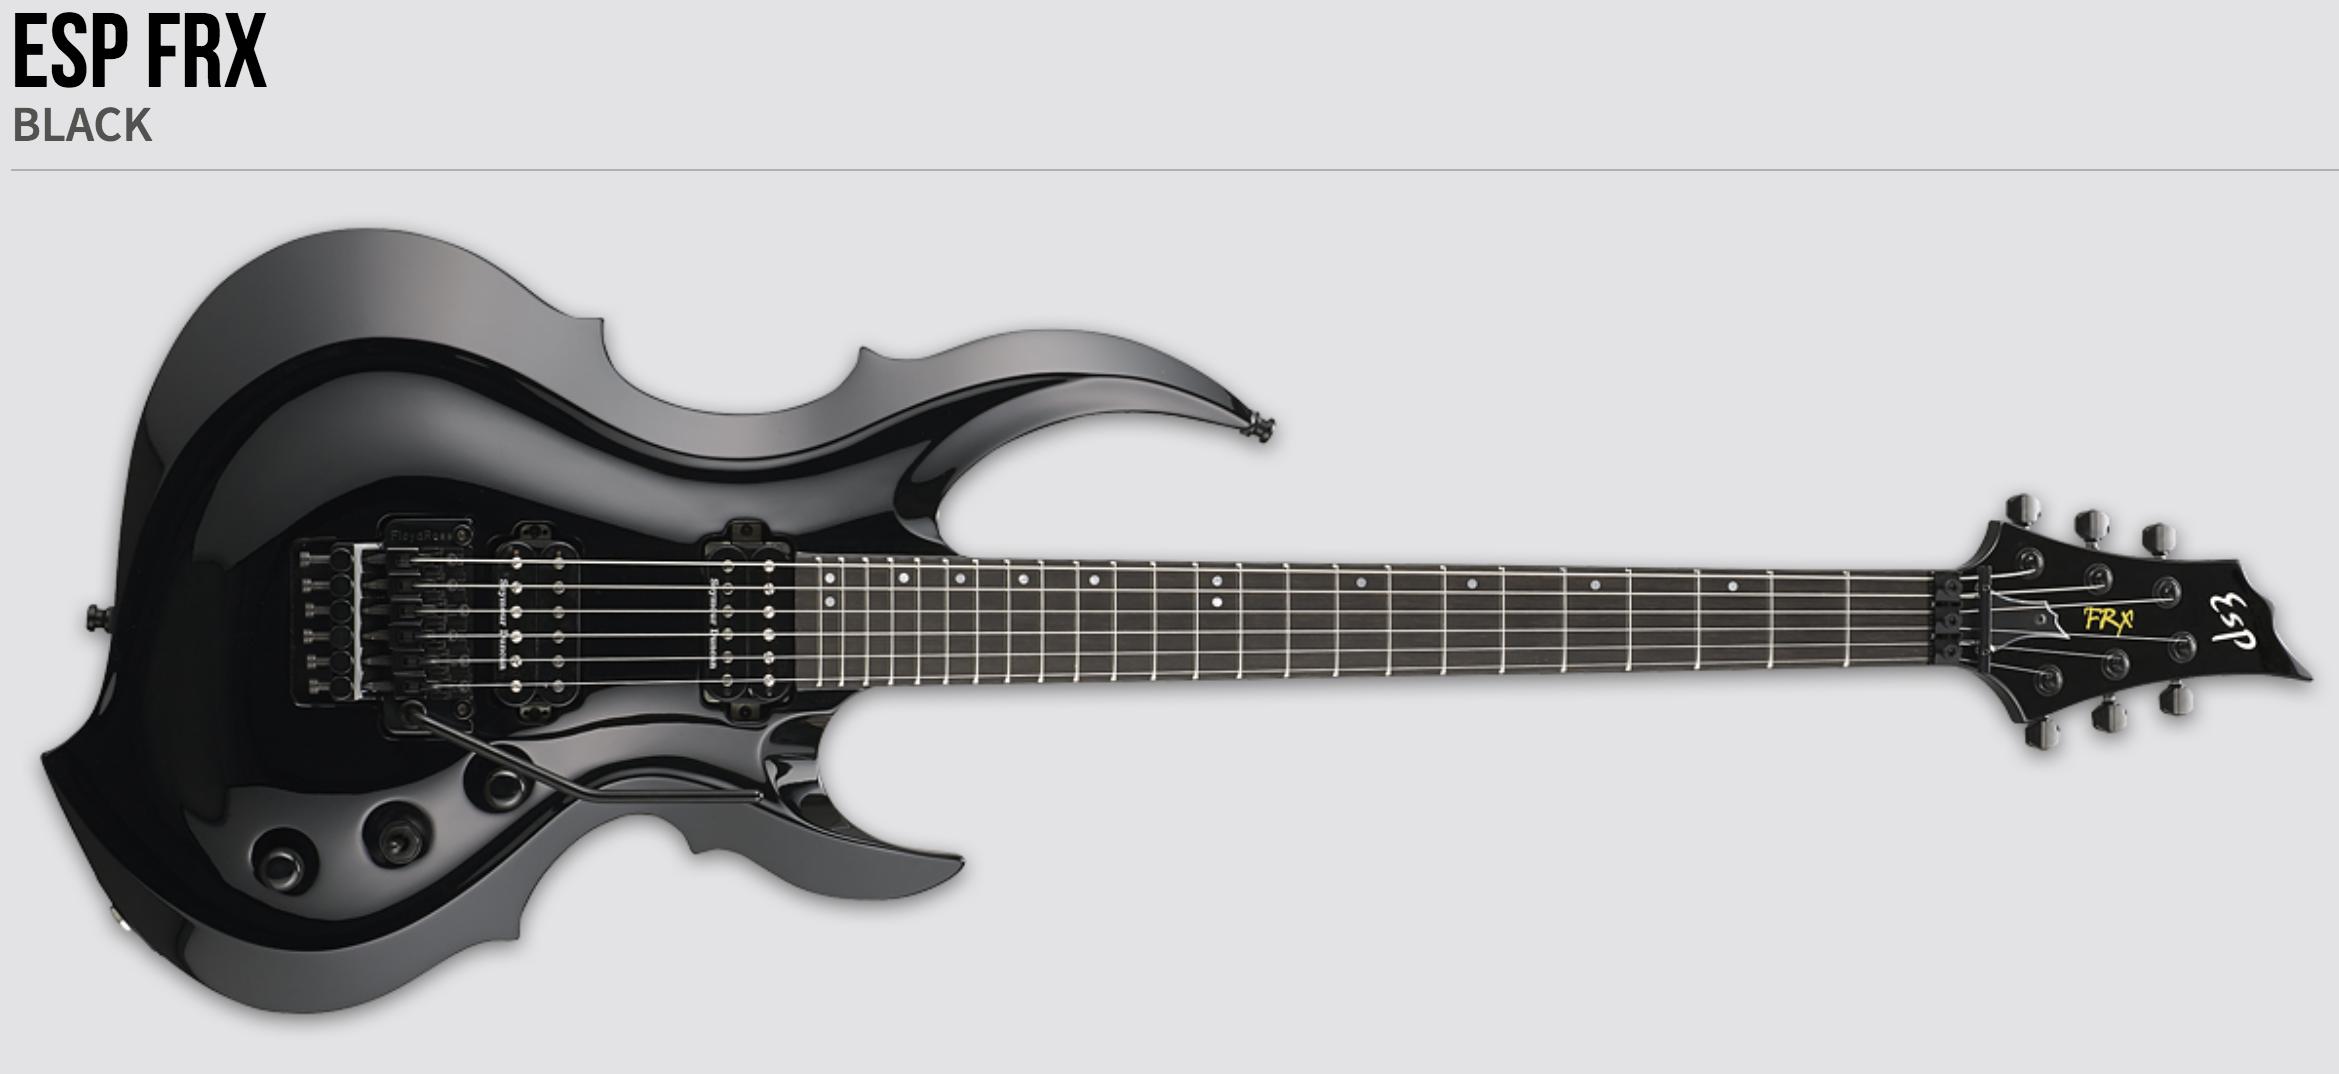 ESP FRX BLACK